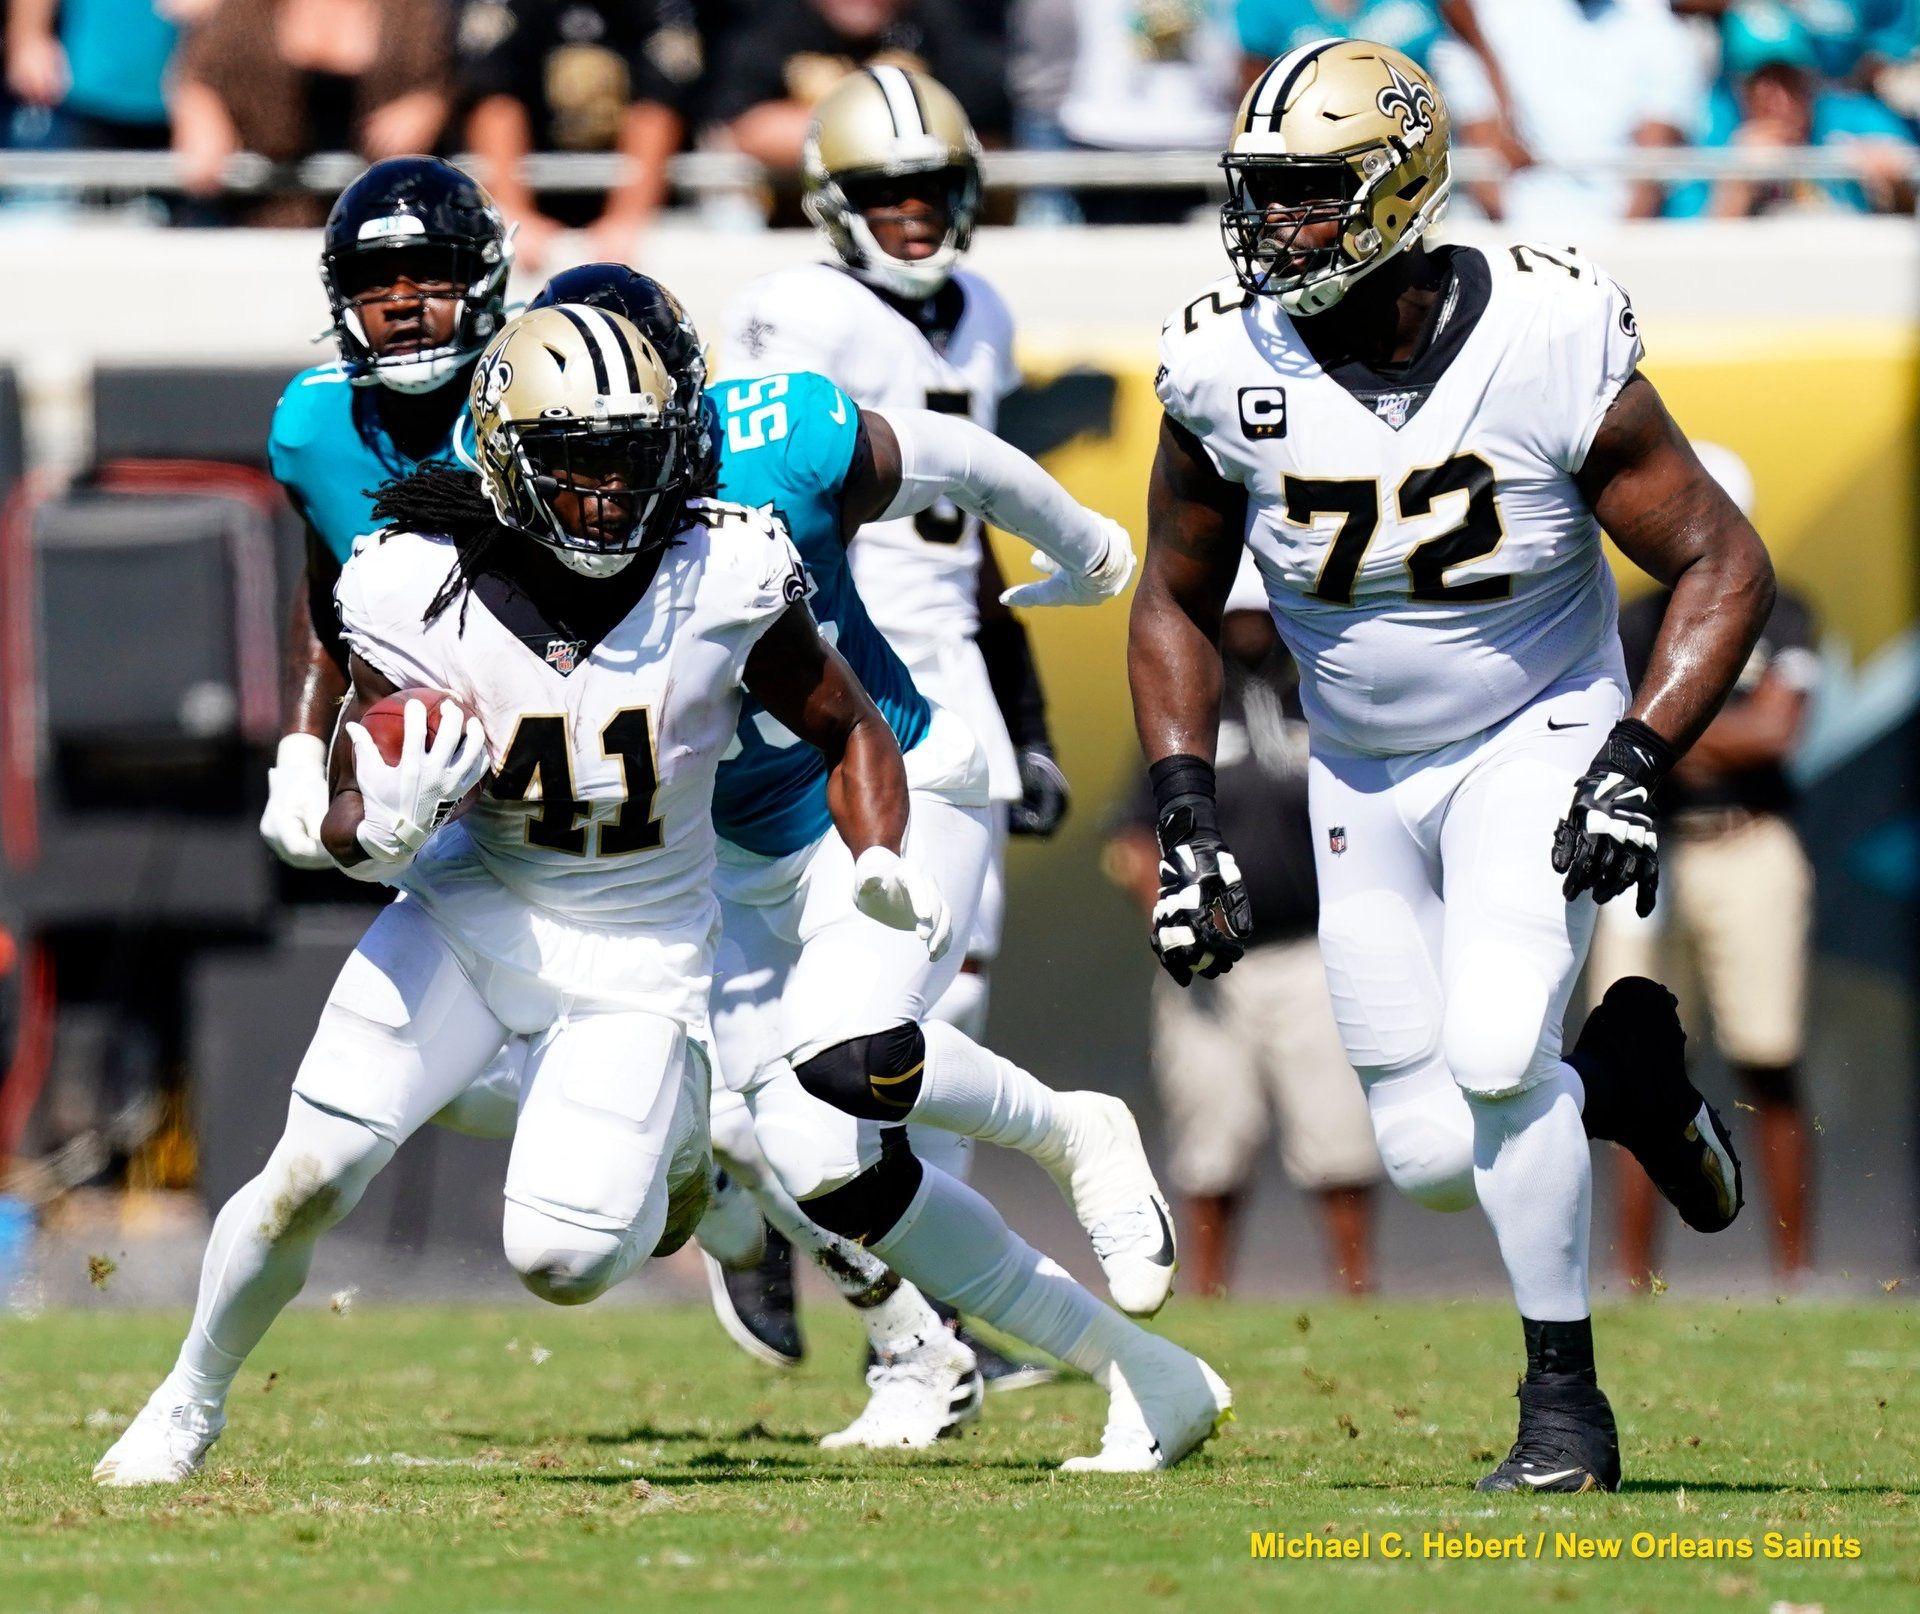 Pin By Kaylynn Mash On New Orleans Saints New Orleans Saints Football Saints Football New Orleans Saints